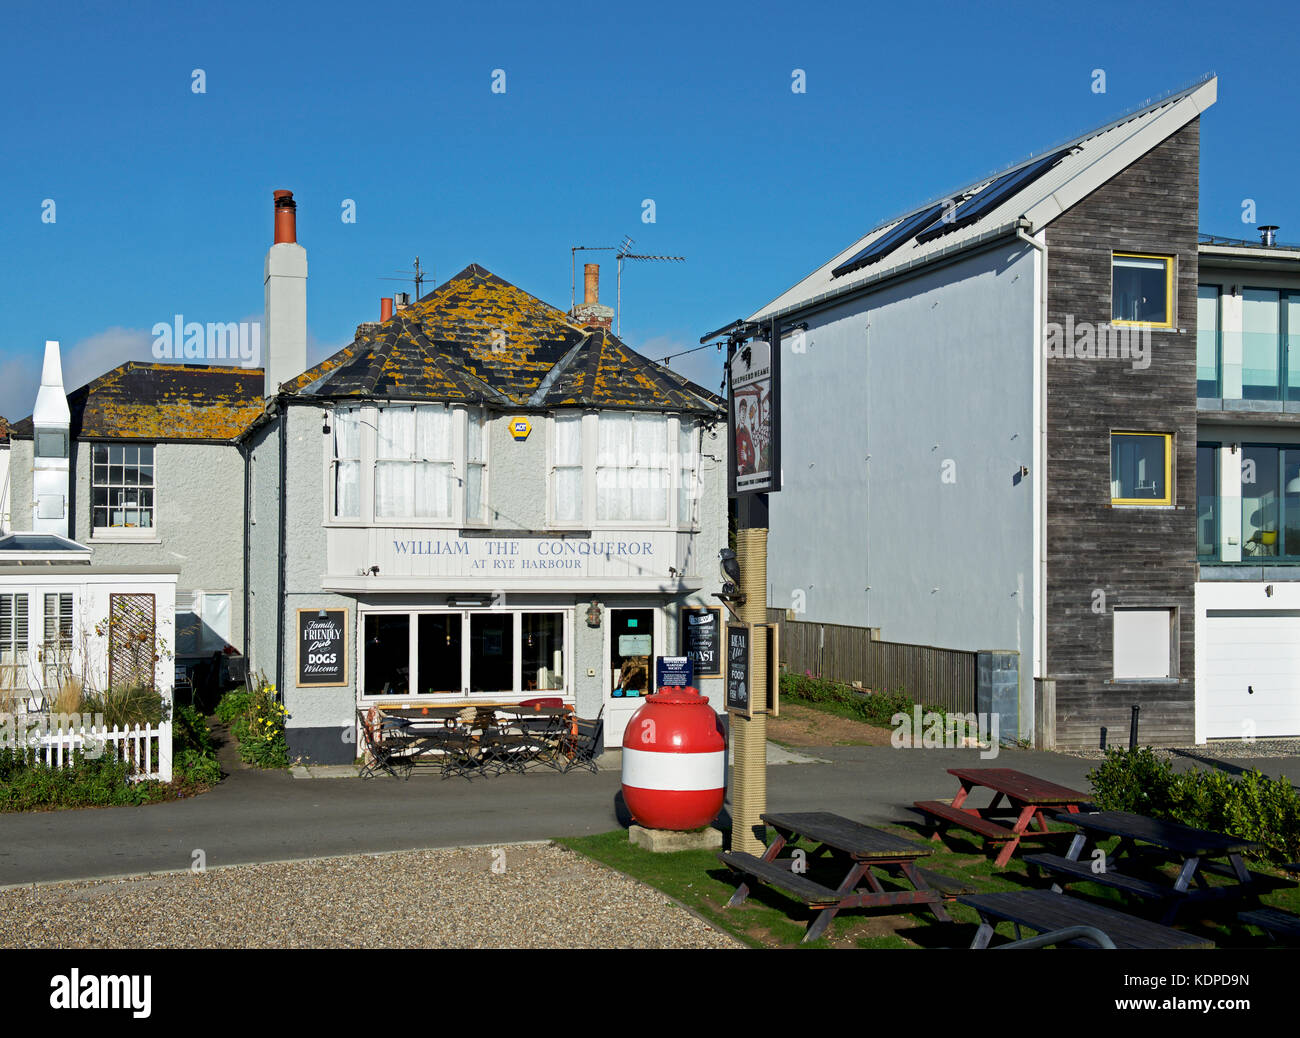 Pub - William the Conqueror - at Rye Harbour, East Sussex, England UK - Stock Image